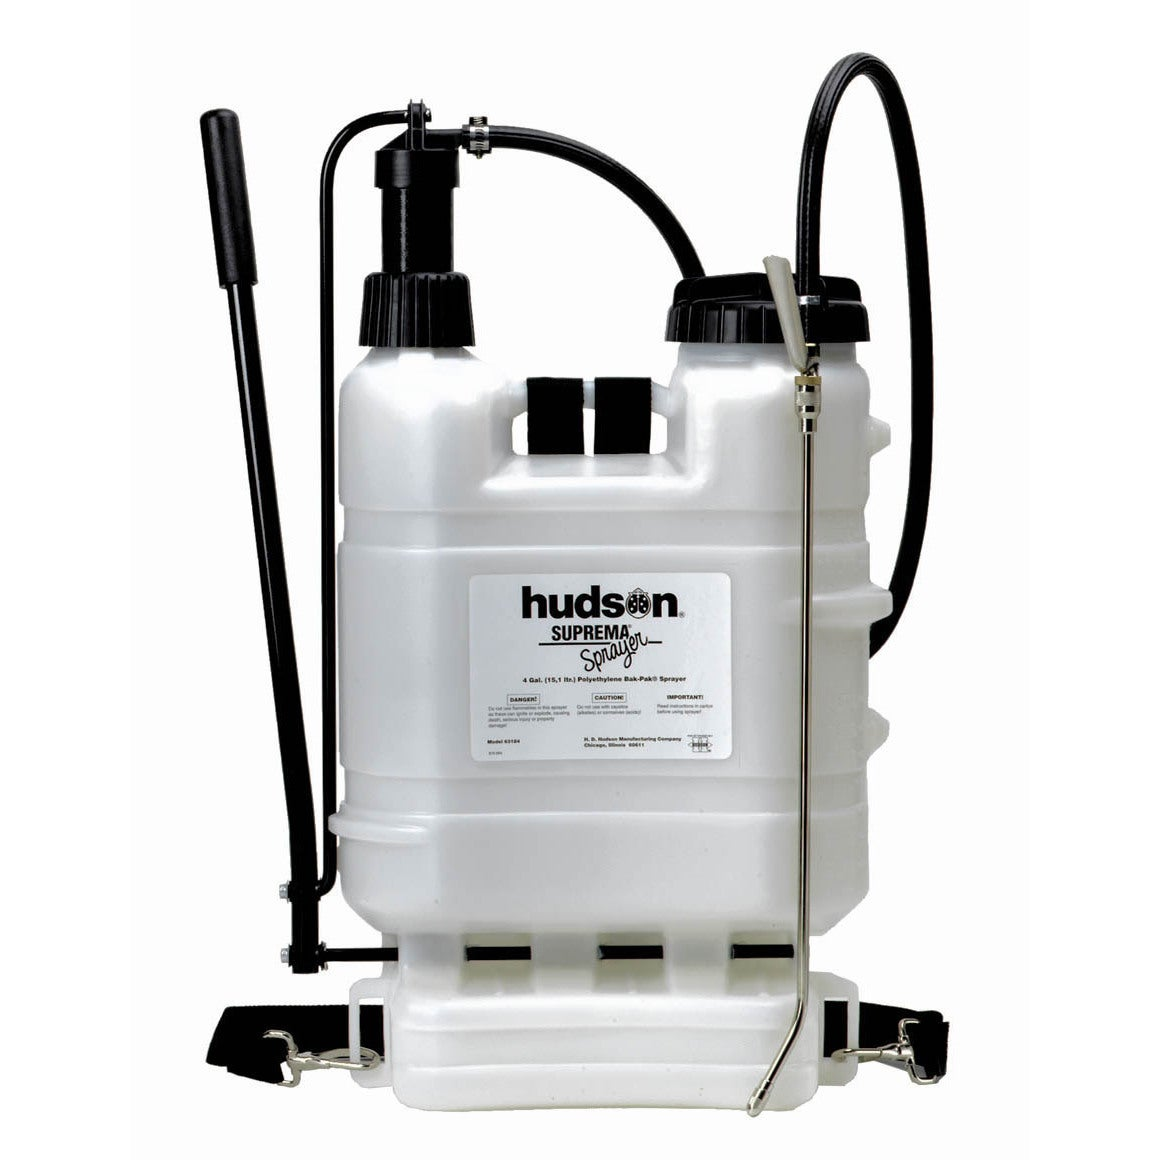 Hudson Valley Lighting 63184 4 Gallon Suprema Bak-Pak Spr...